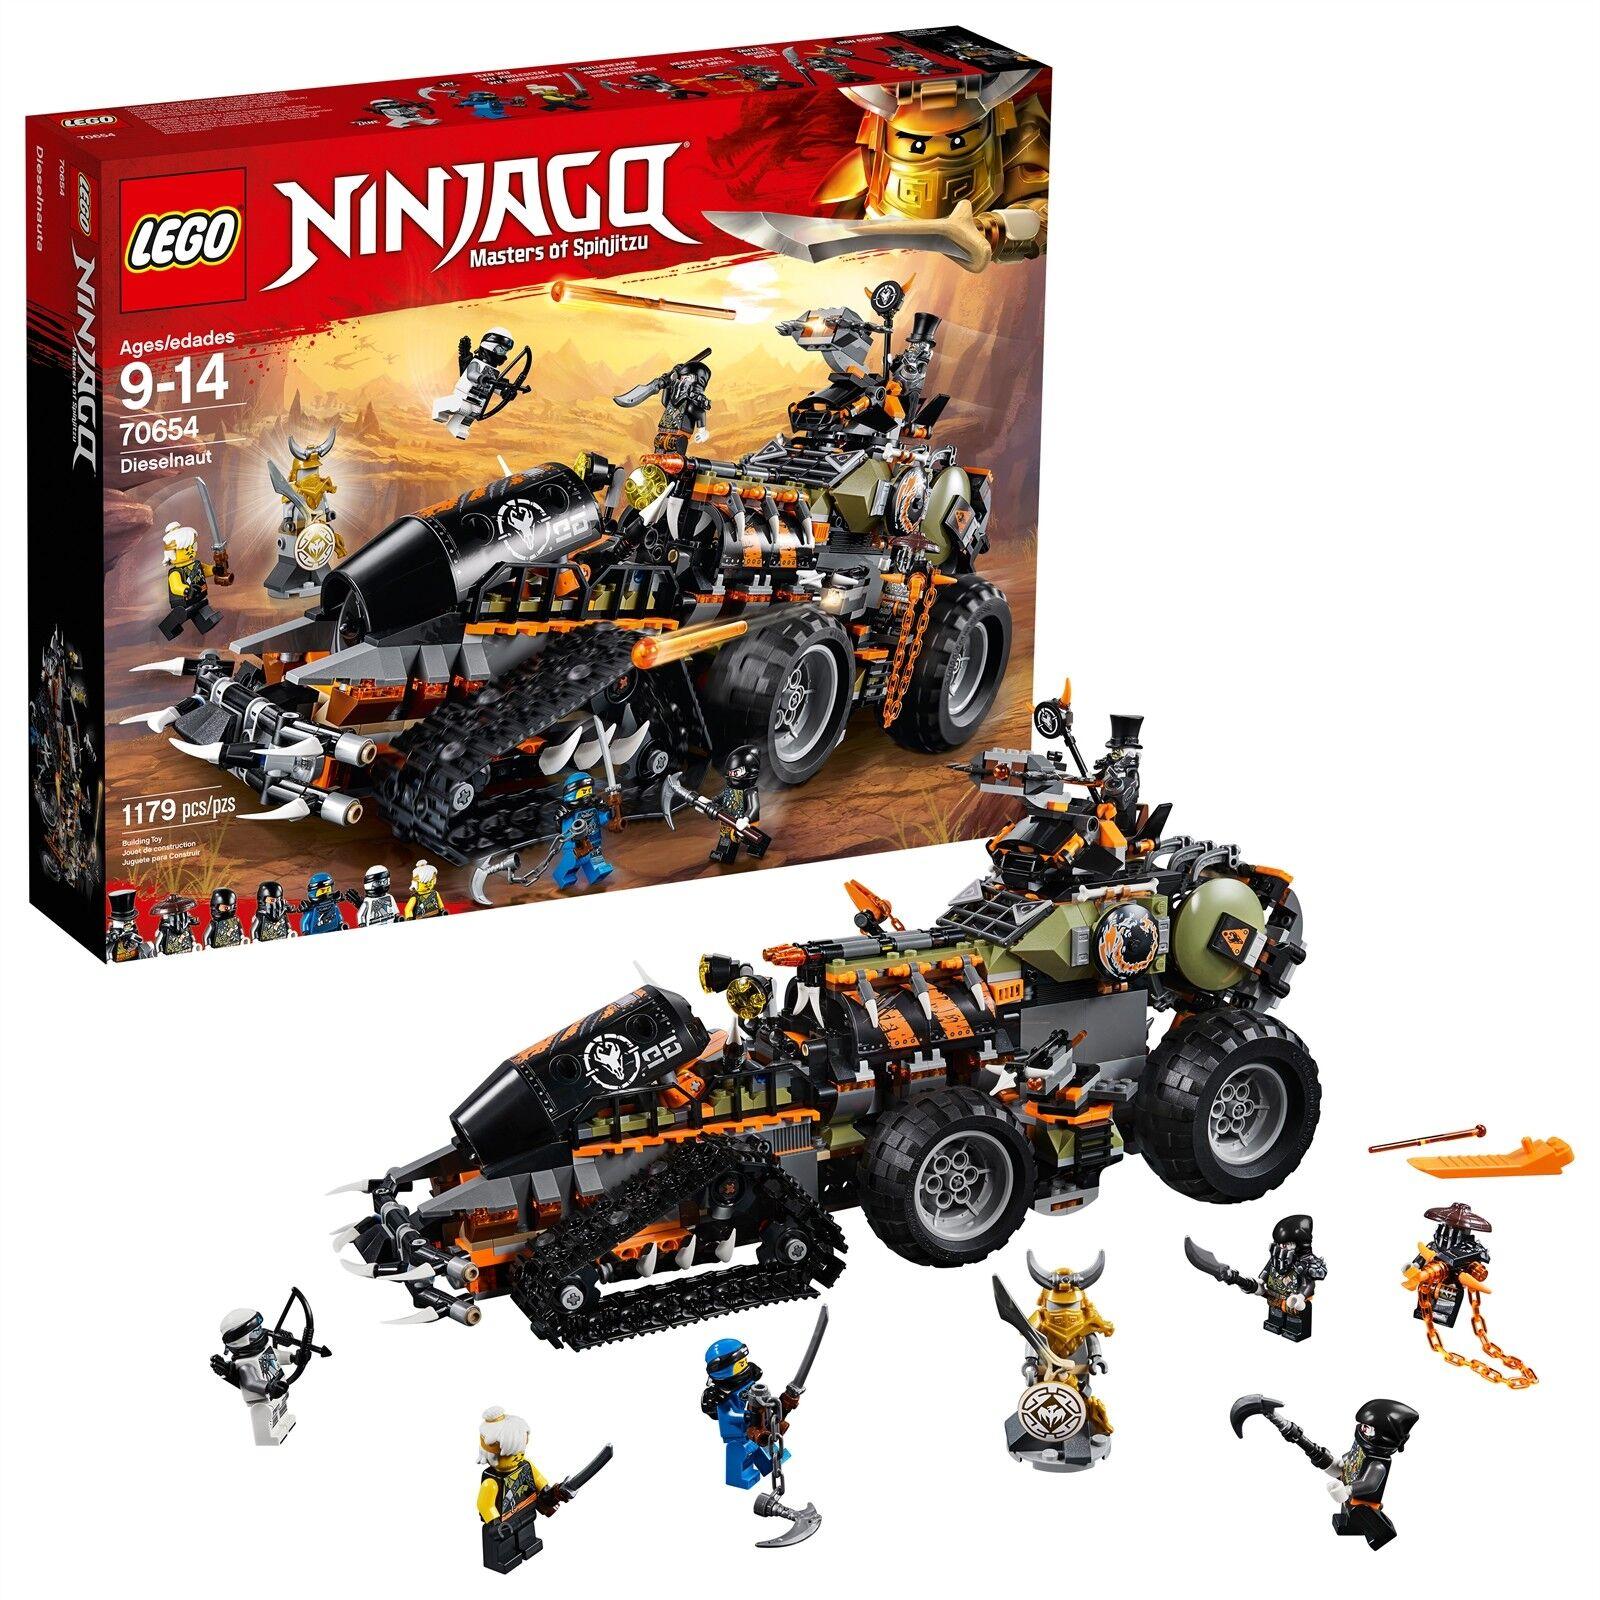 Lego ® Ninjago ® - dieselnaut 70654 1179 piezas